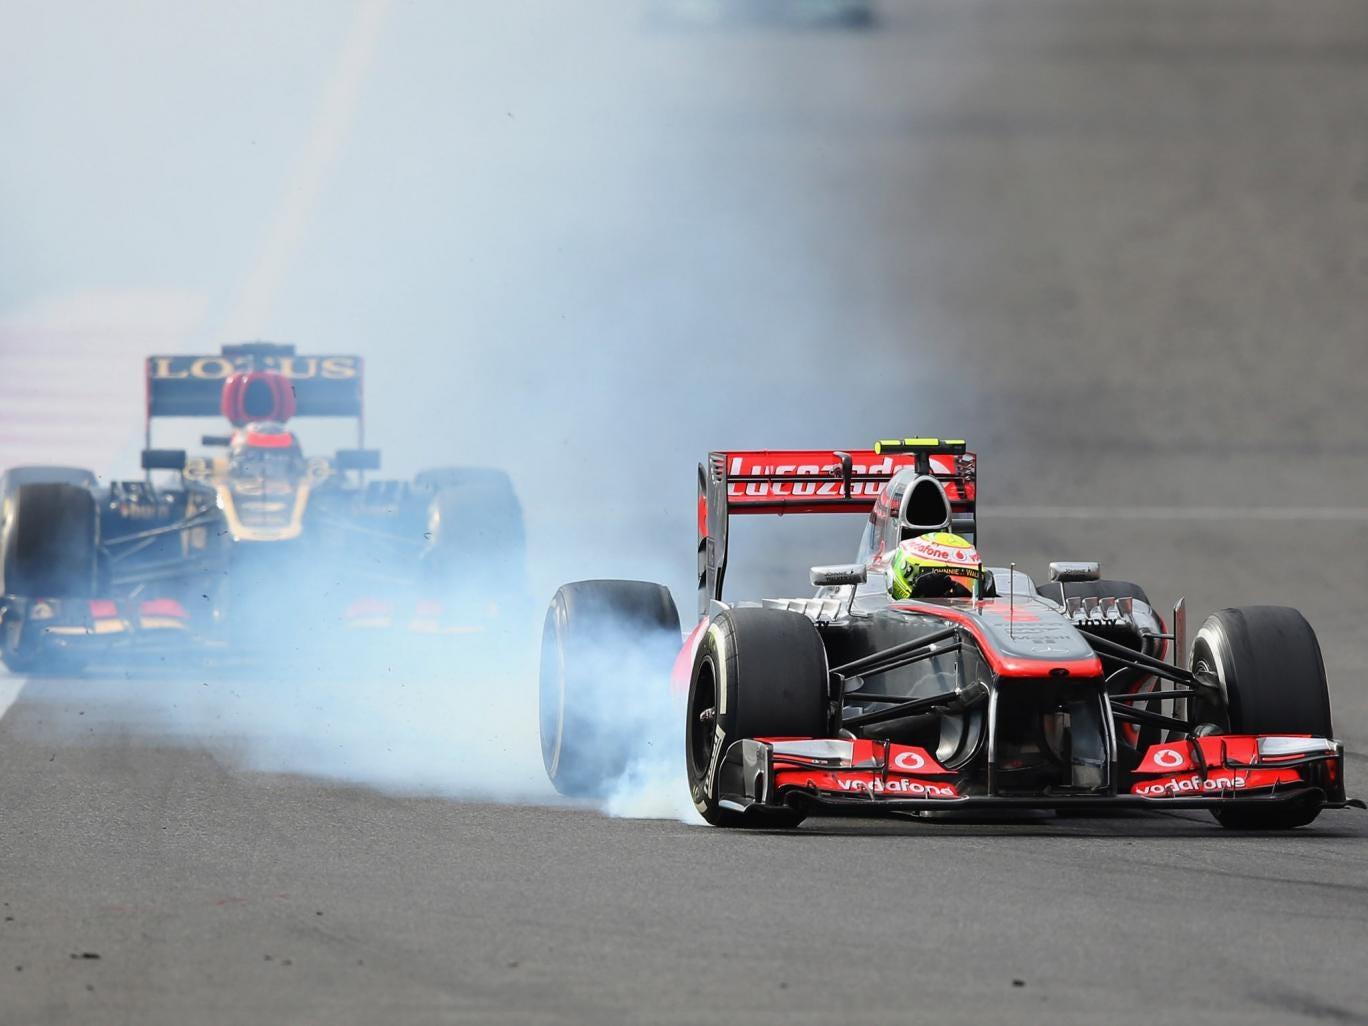 Sergio Perez of Mexico and McLaren locks his brakes while driving during the Korean Formula One Grand Prix